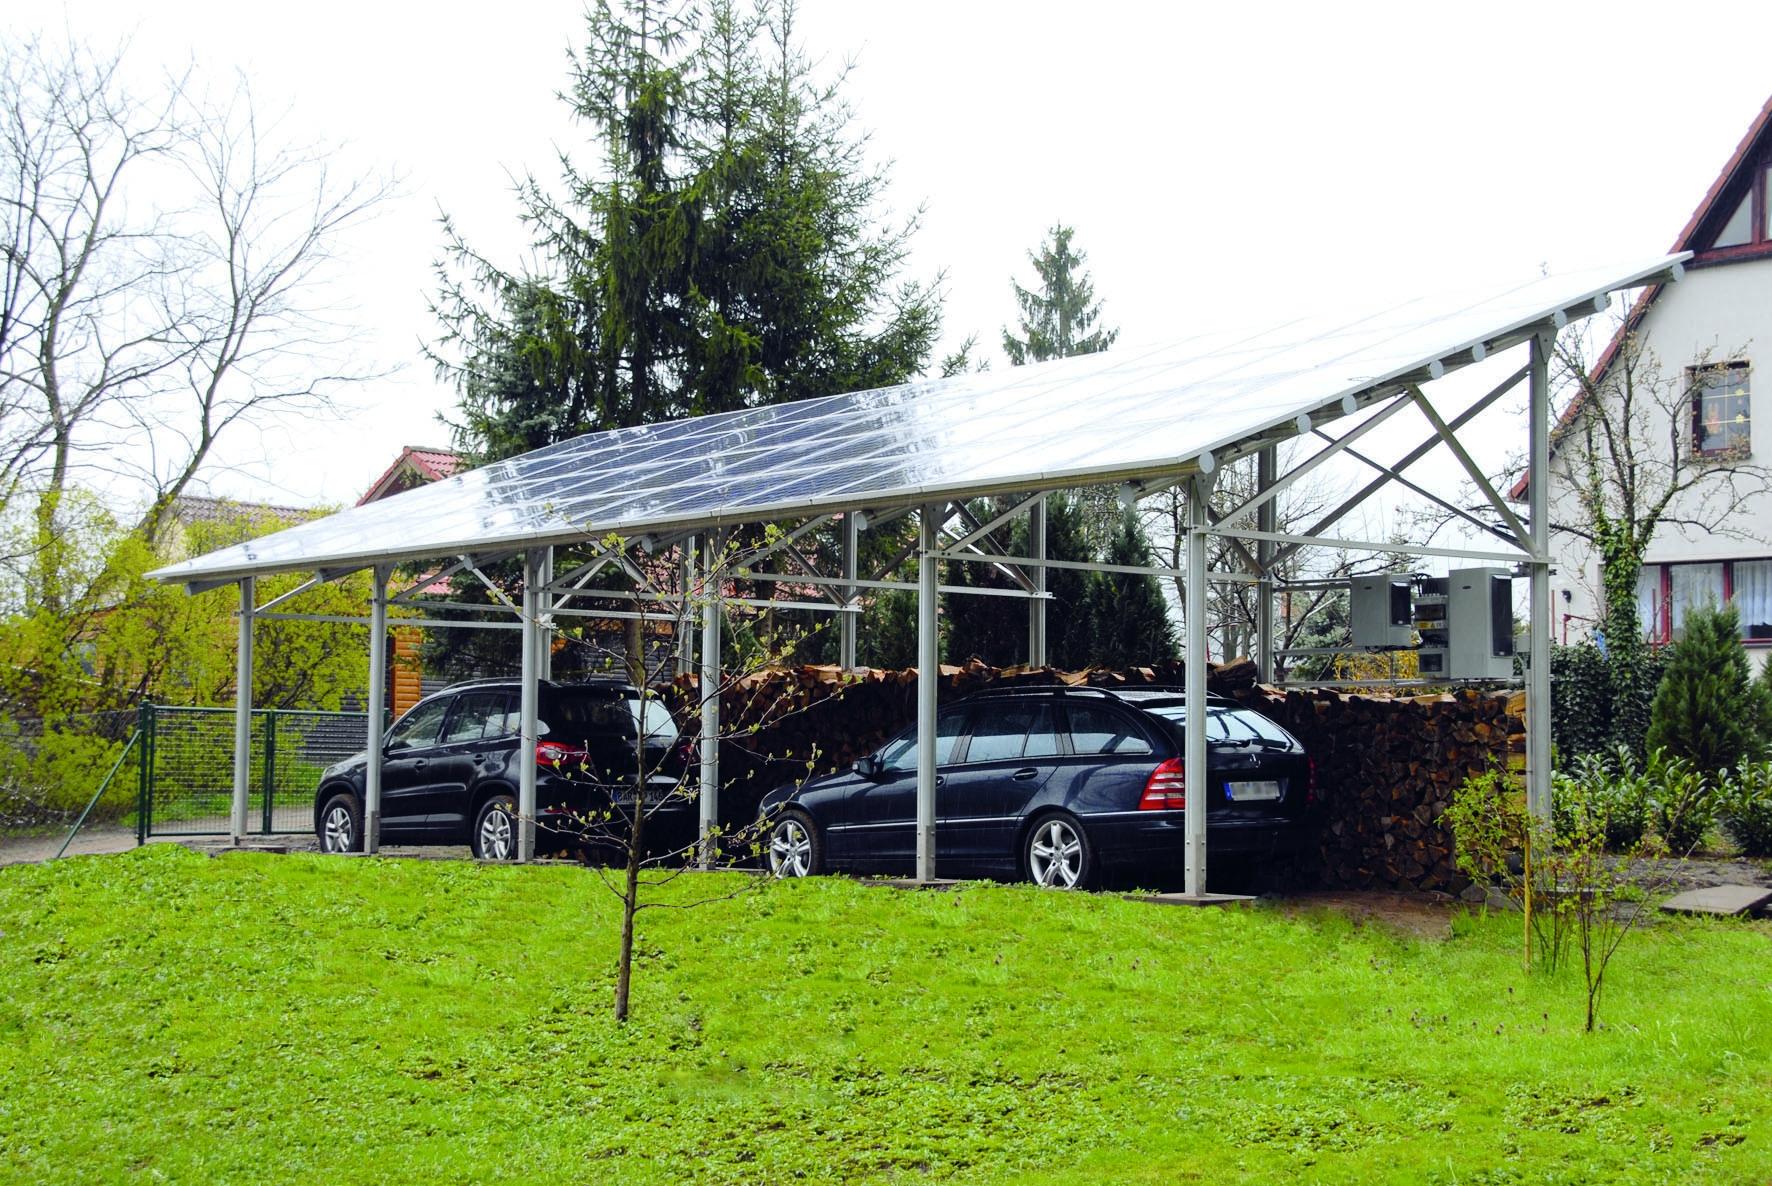 solarcarport garagen systeme elektrogro handel moelle. Black Bedroom Furniture Sets. Home Design Ideas